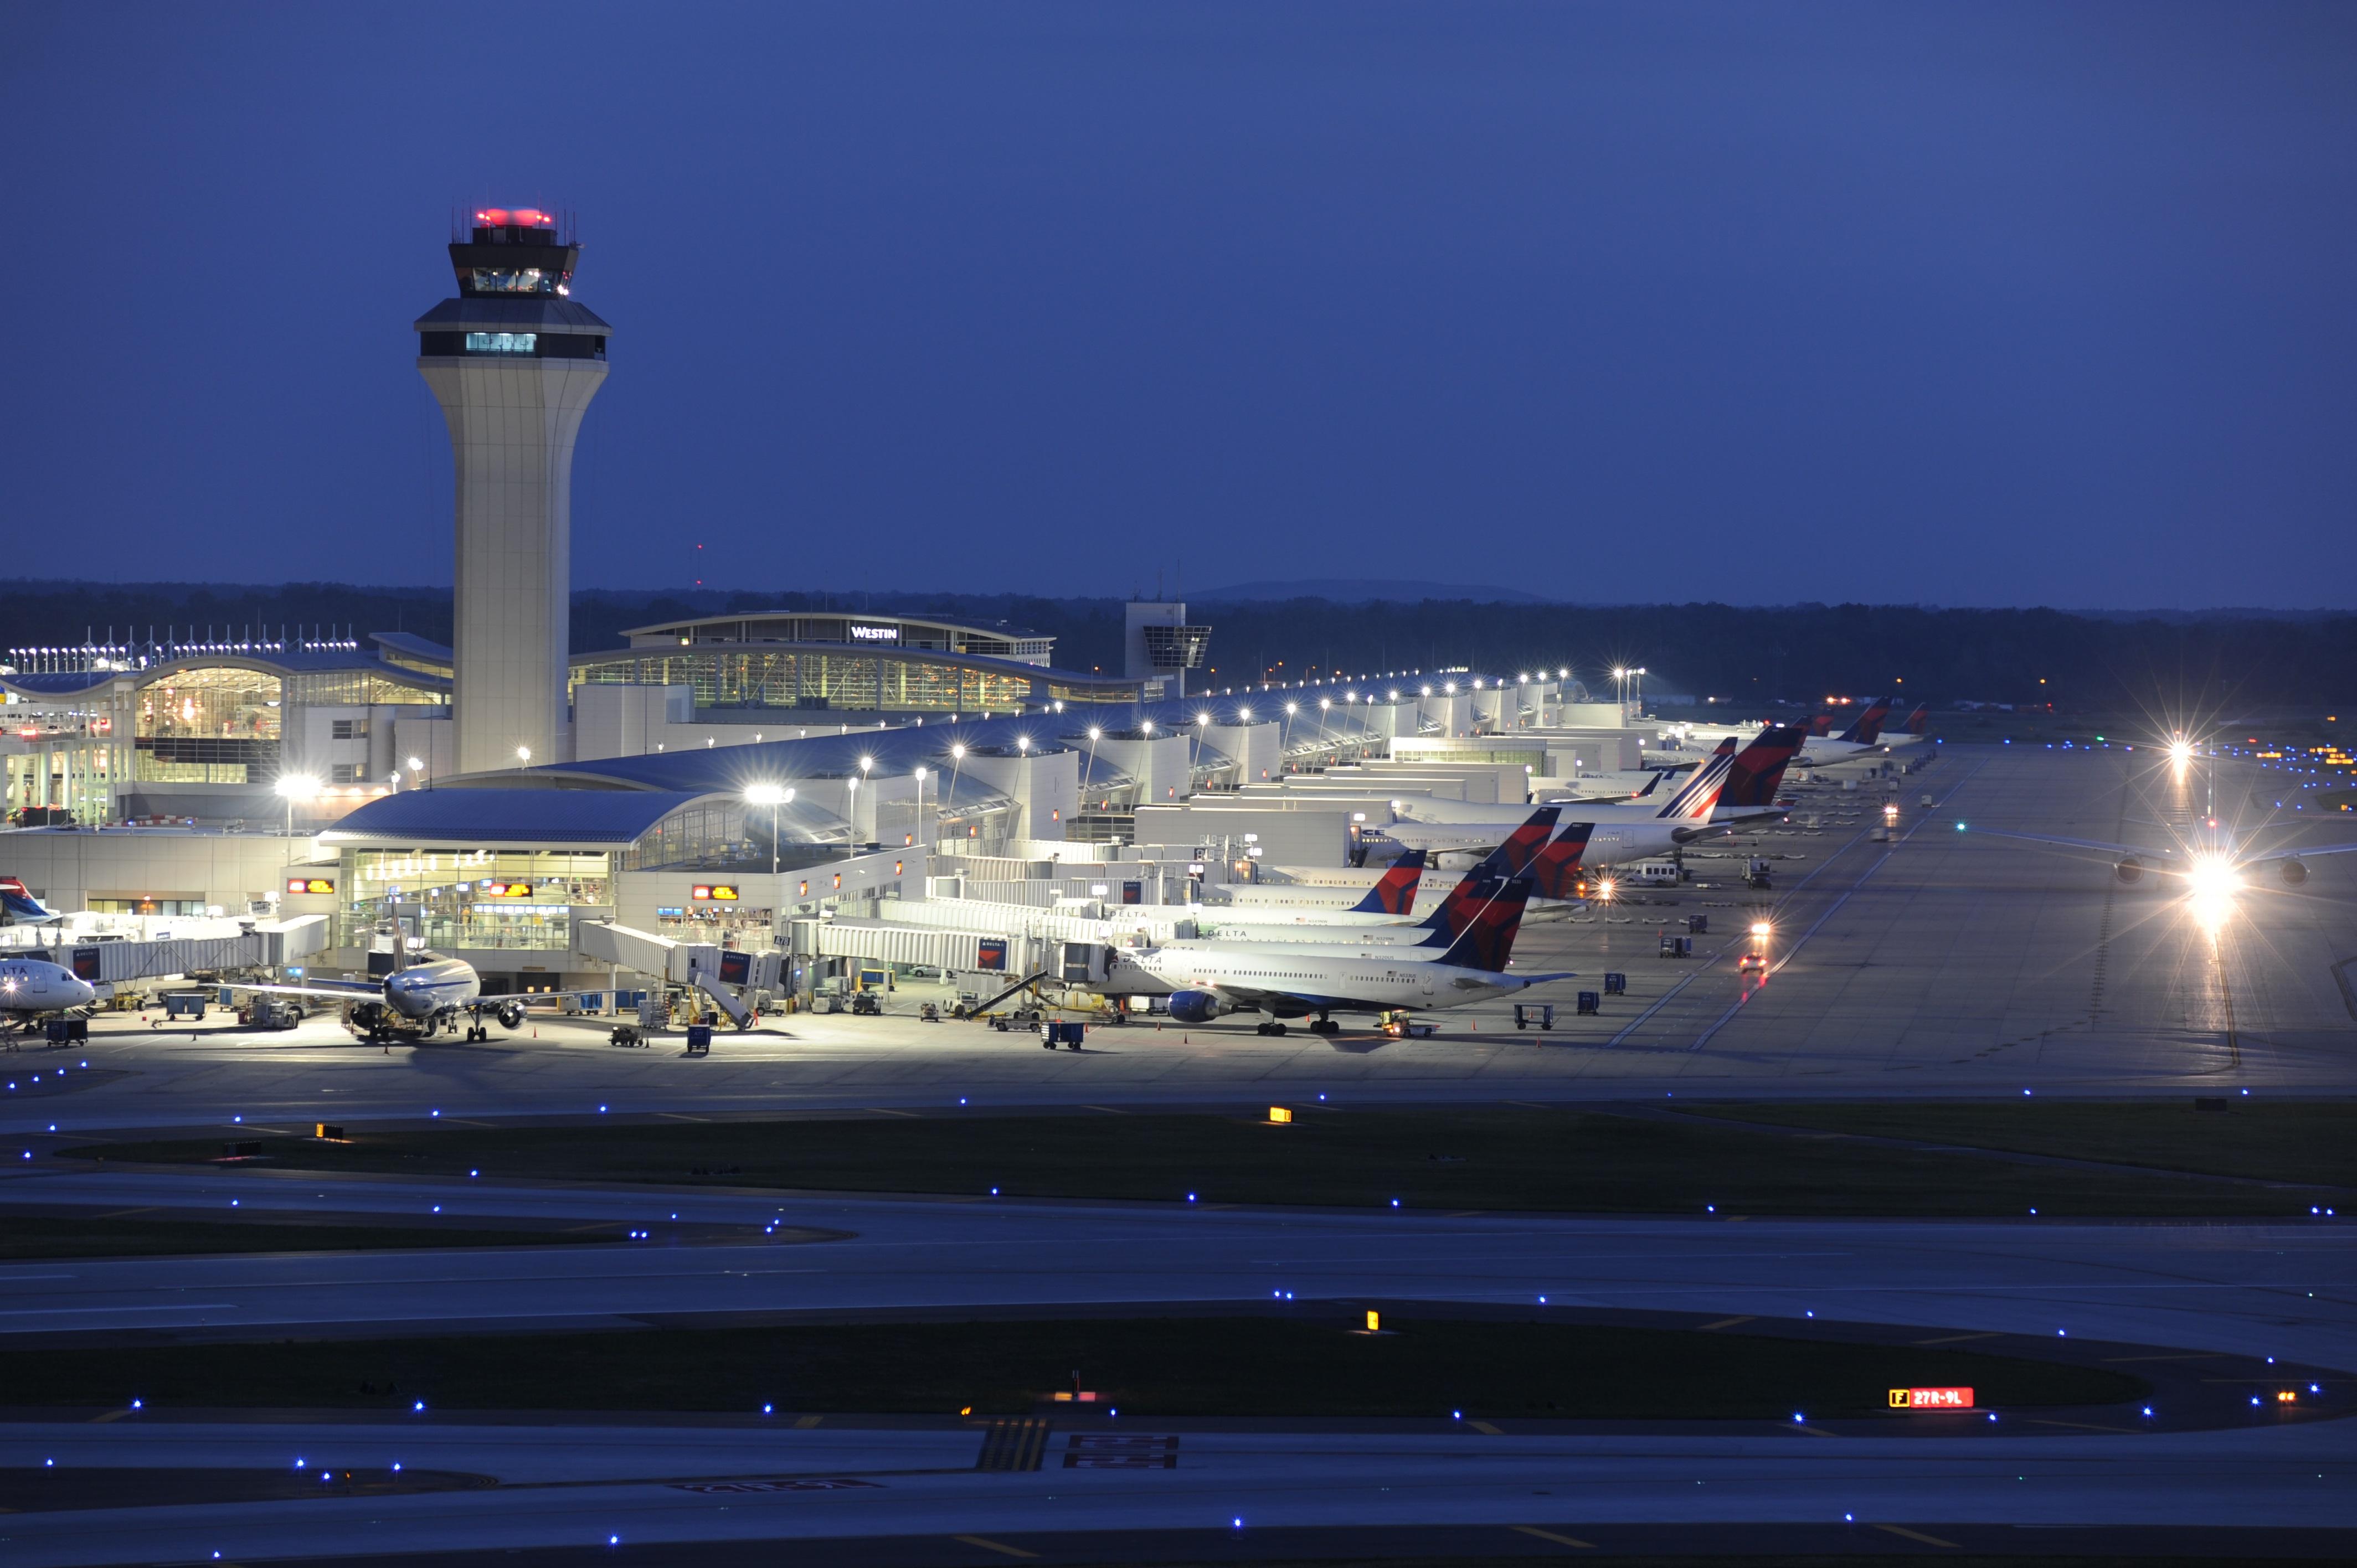 Detroit Metropolitan Airport's Midfield Terminal